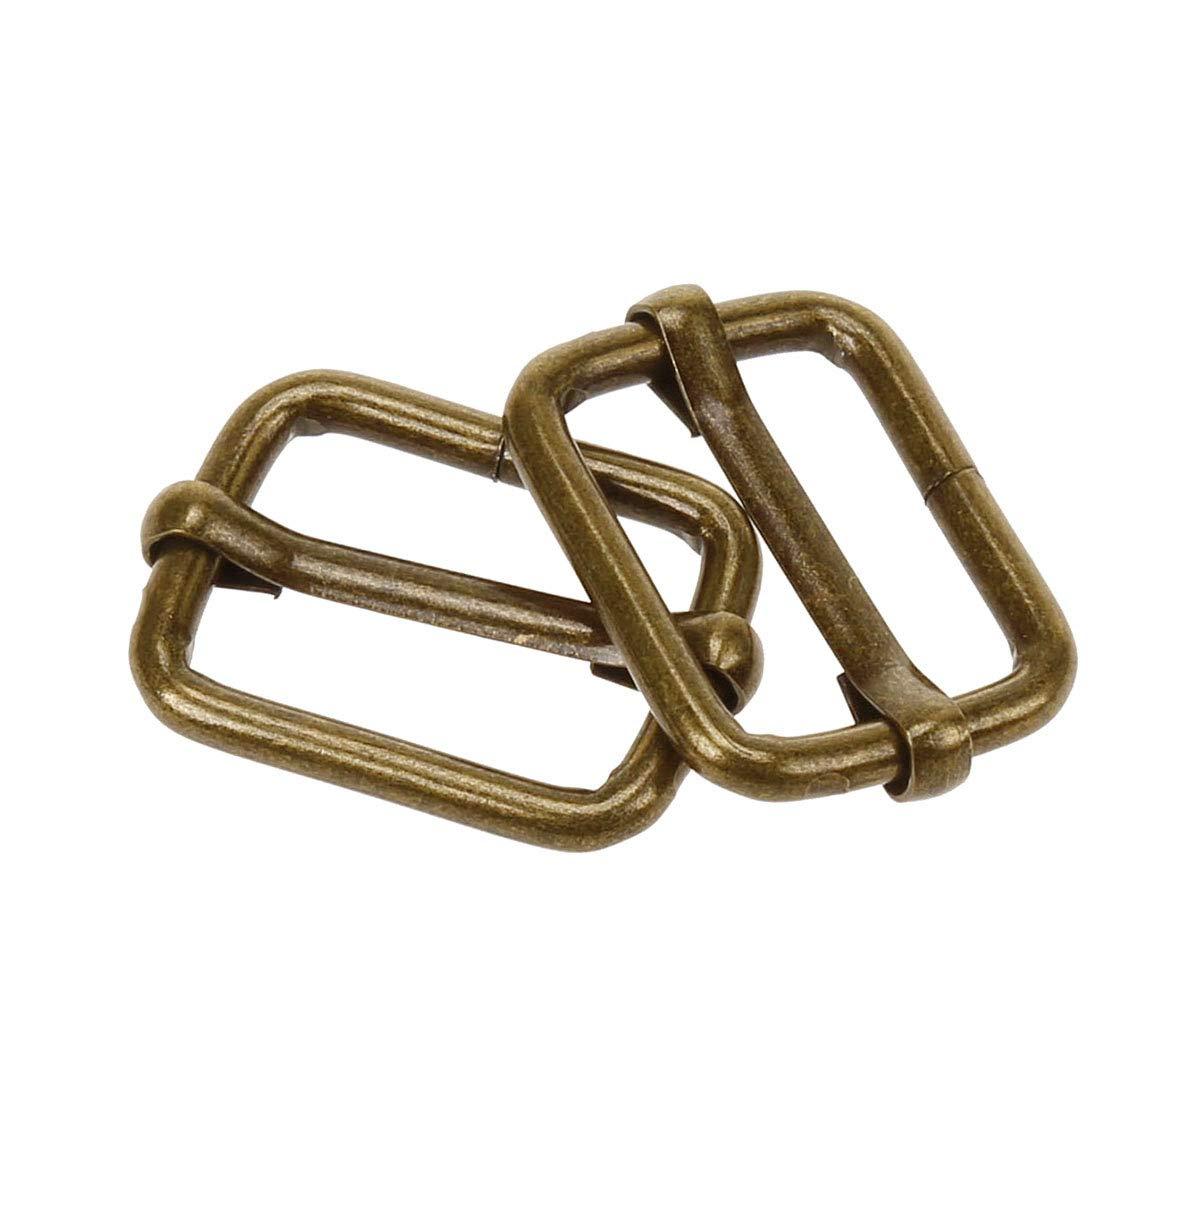 COTOWIN Adjustable Metal Slide Rectangle Buckle,Pack of 20, 3//4 inch